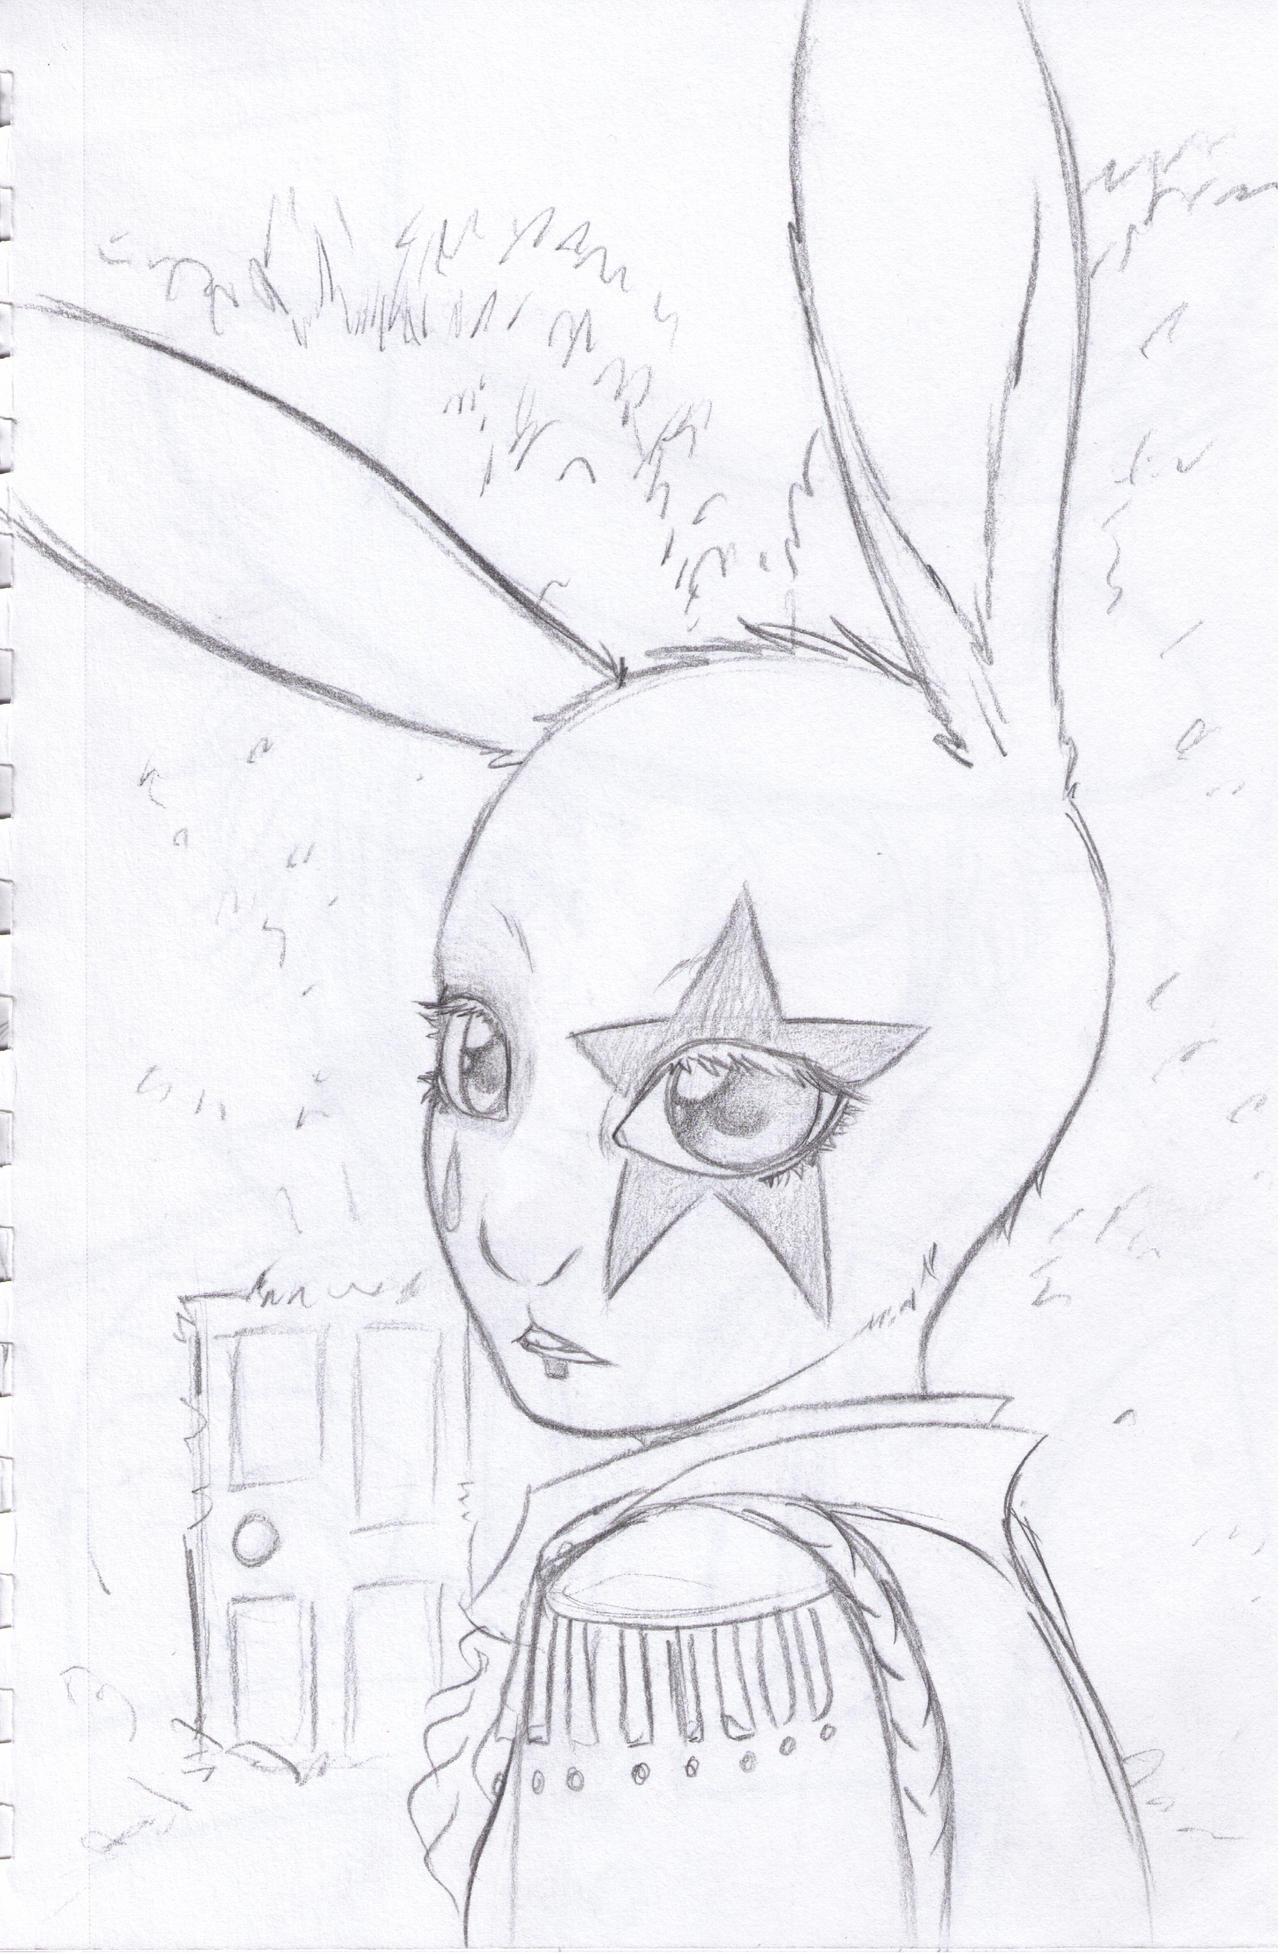 White Rabbit by MightyMaki